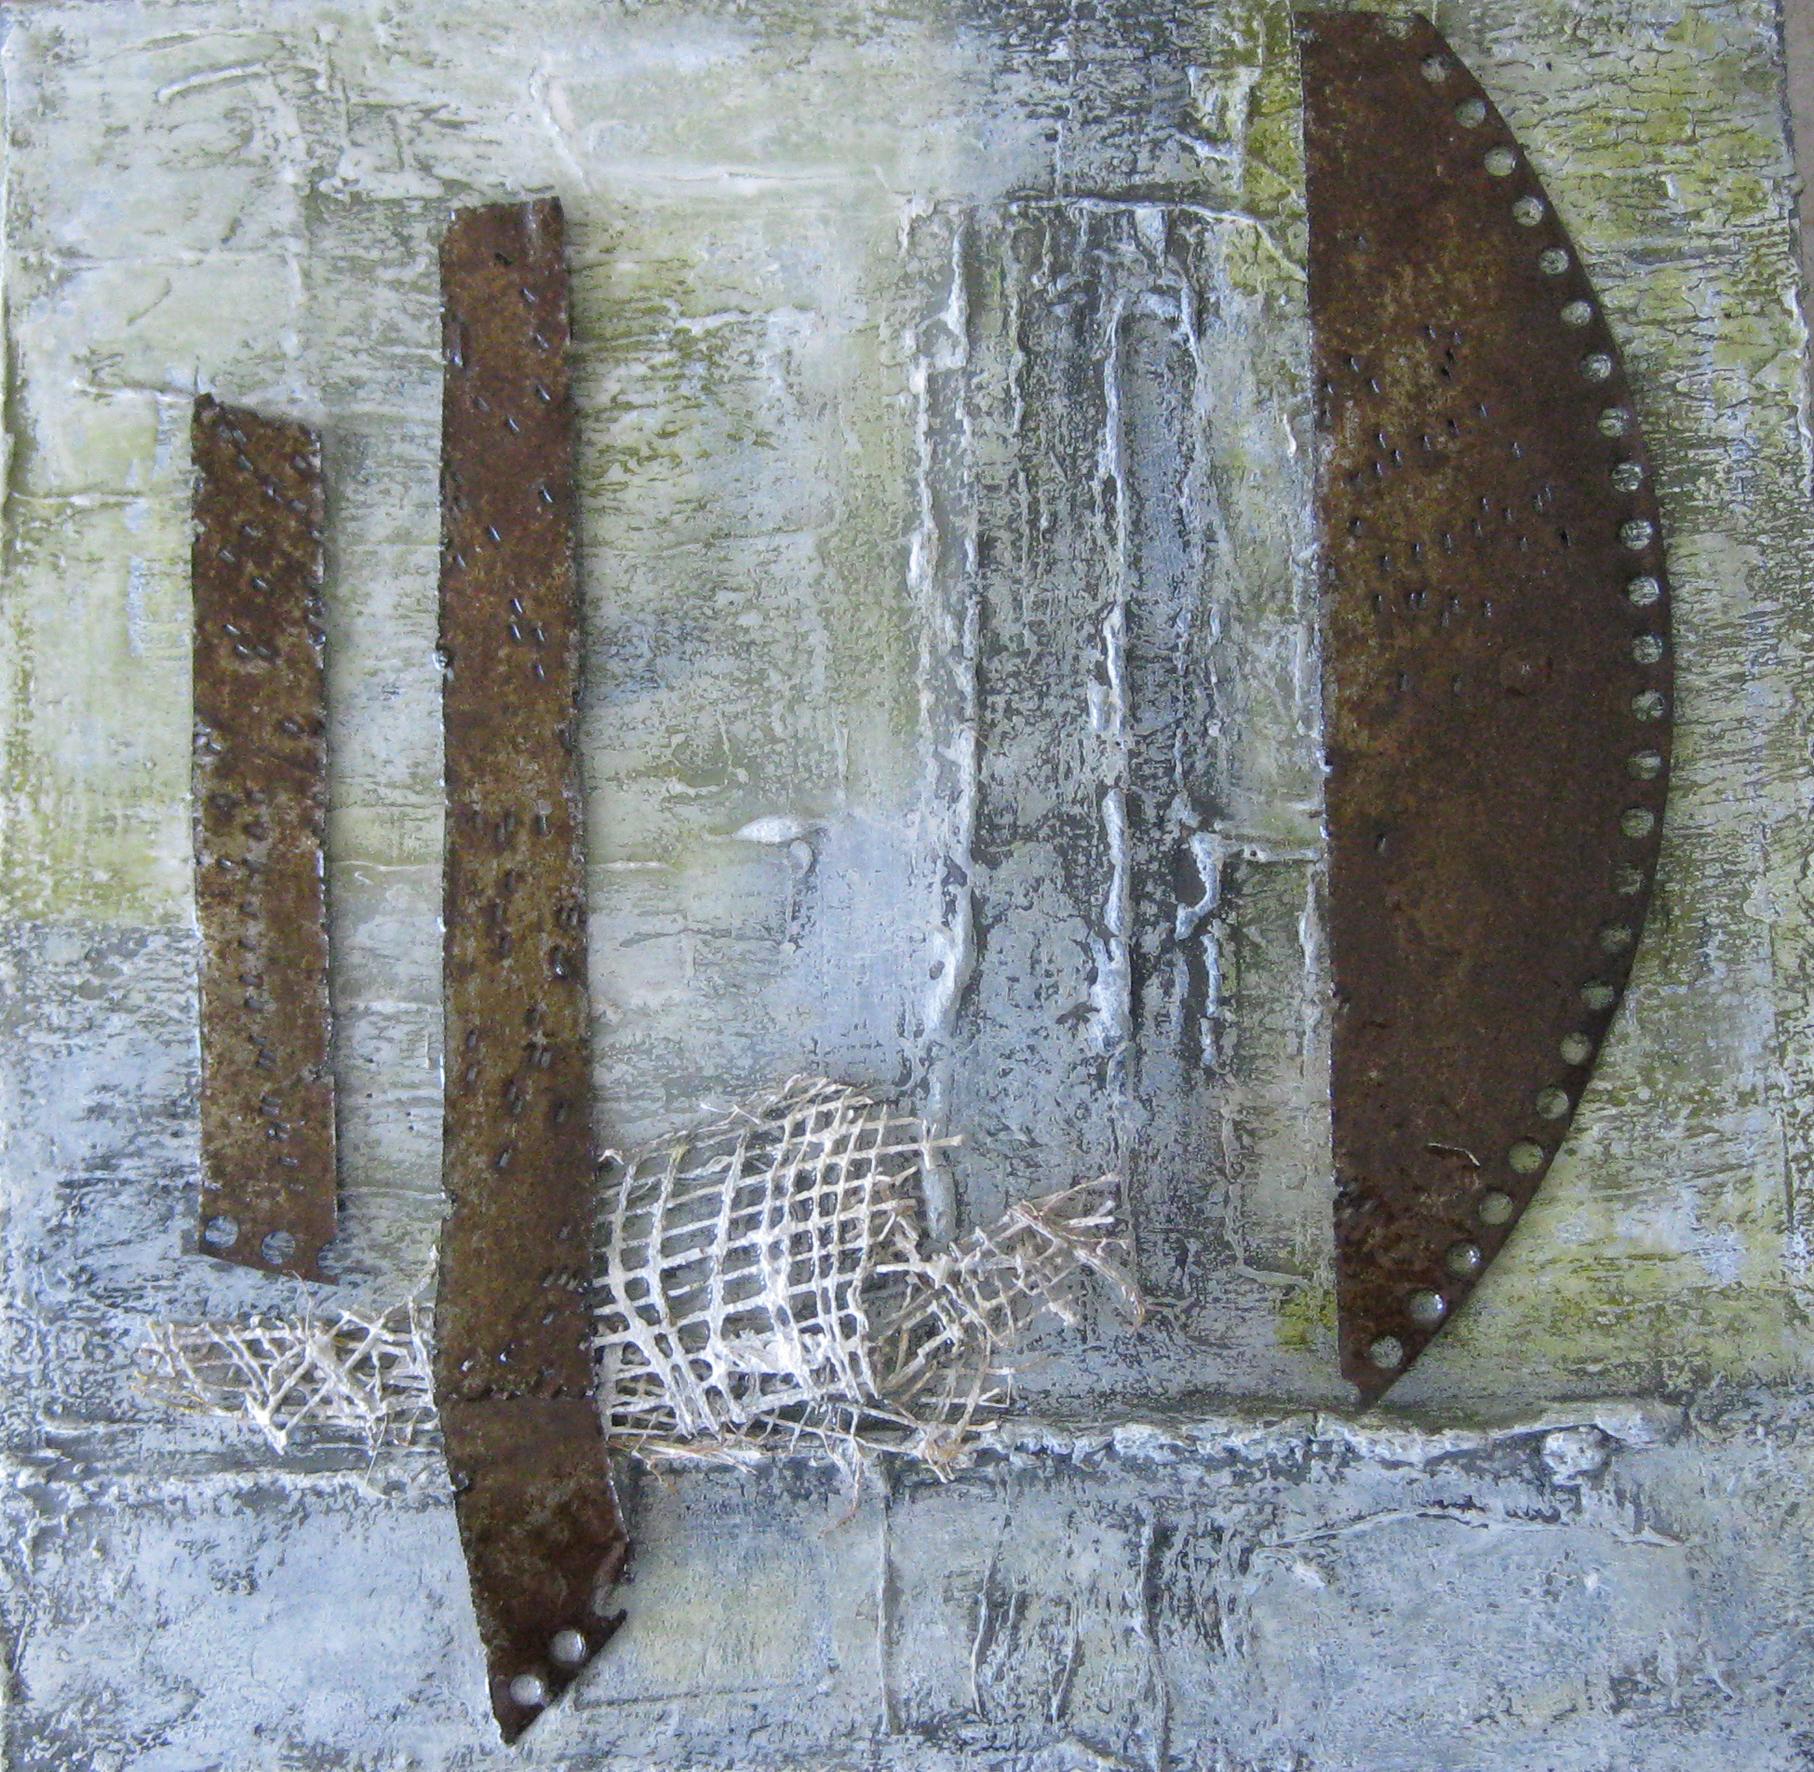 ohne titel, 40 x 40, mixed media, Metall, Harzguss